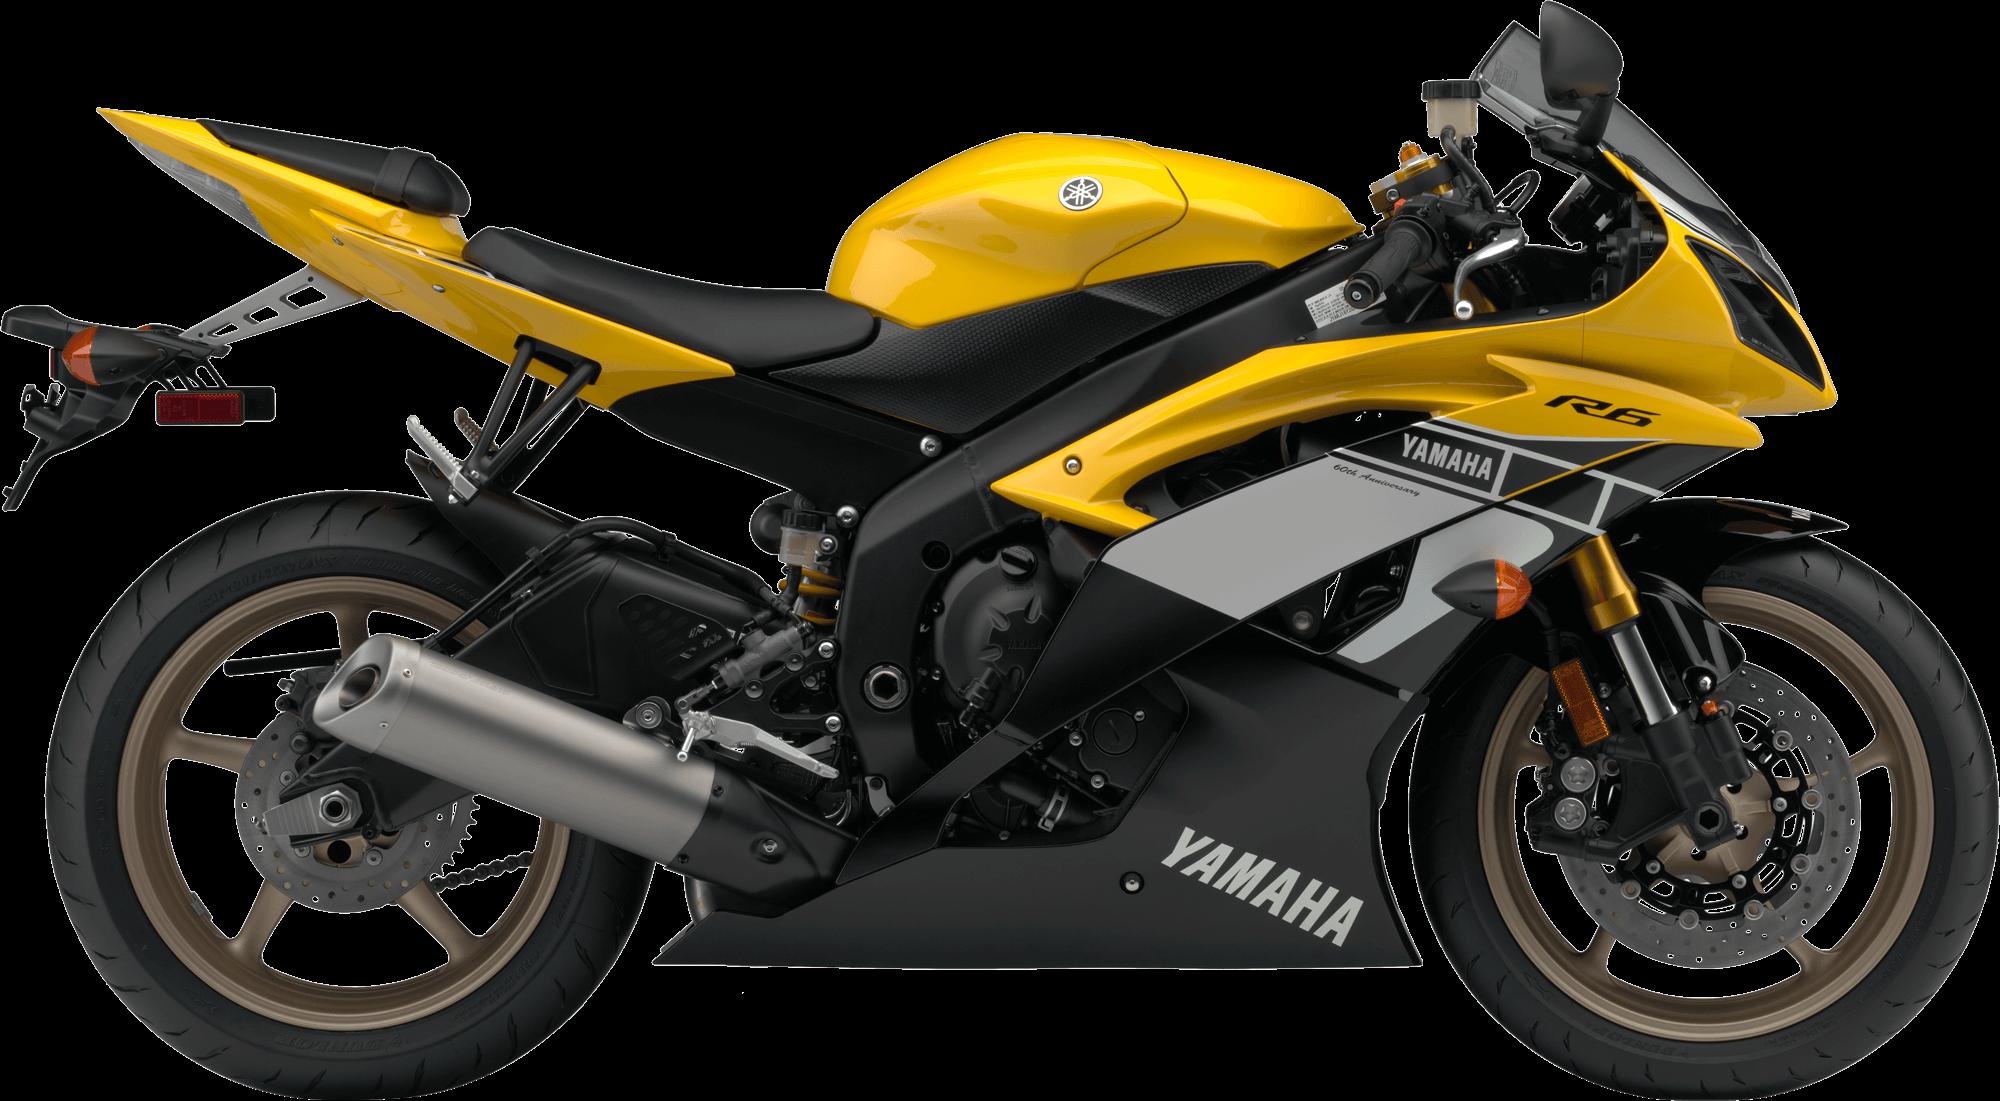 HQ Yamaha R6 Wallpapers | File 559.11Kb